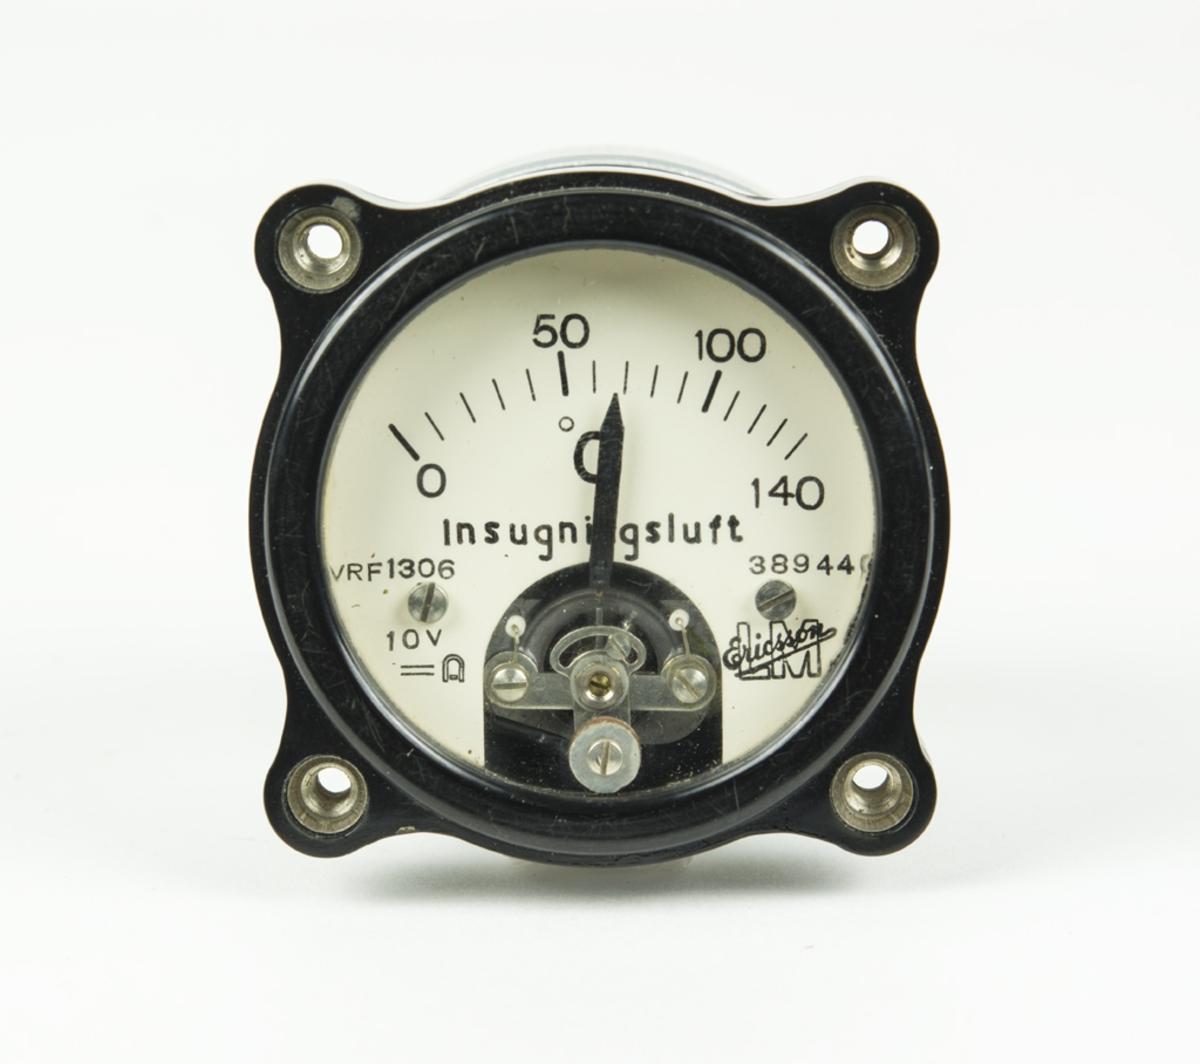 Inloppstemperaturmätare VRF 1306.